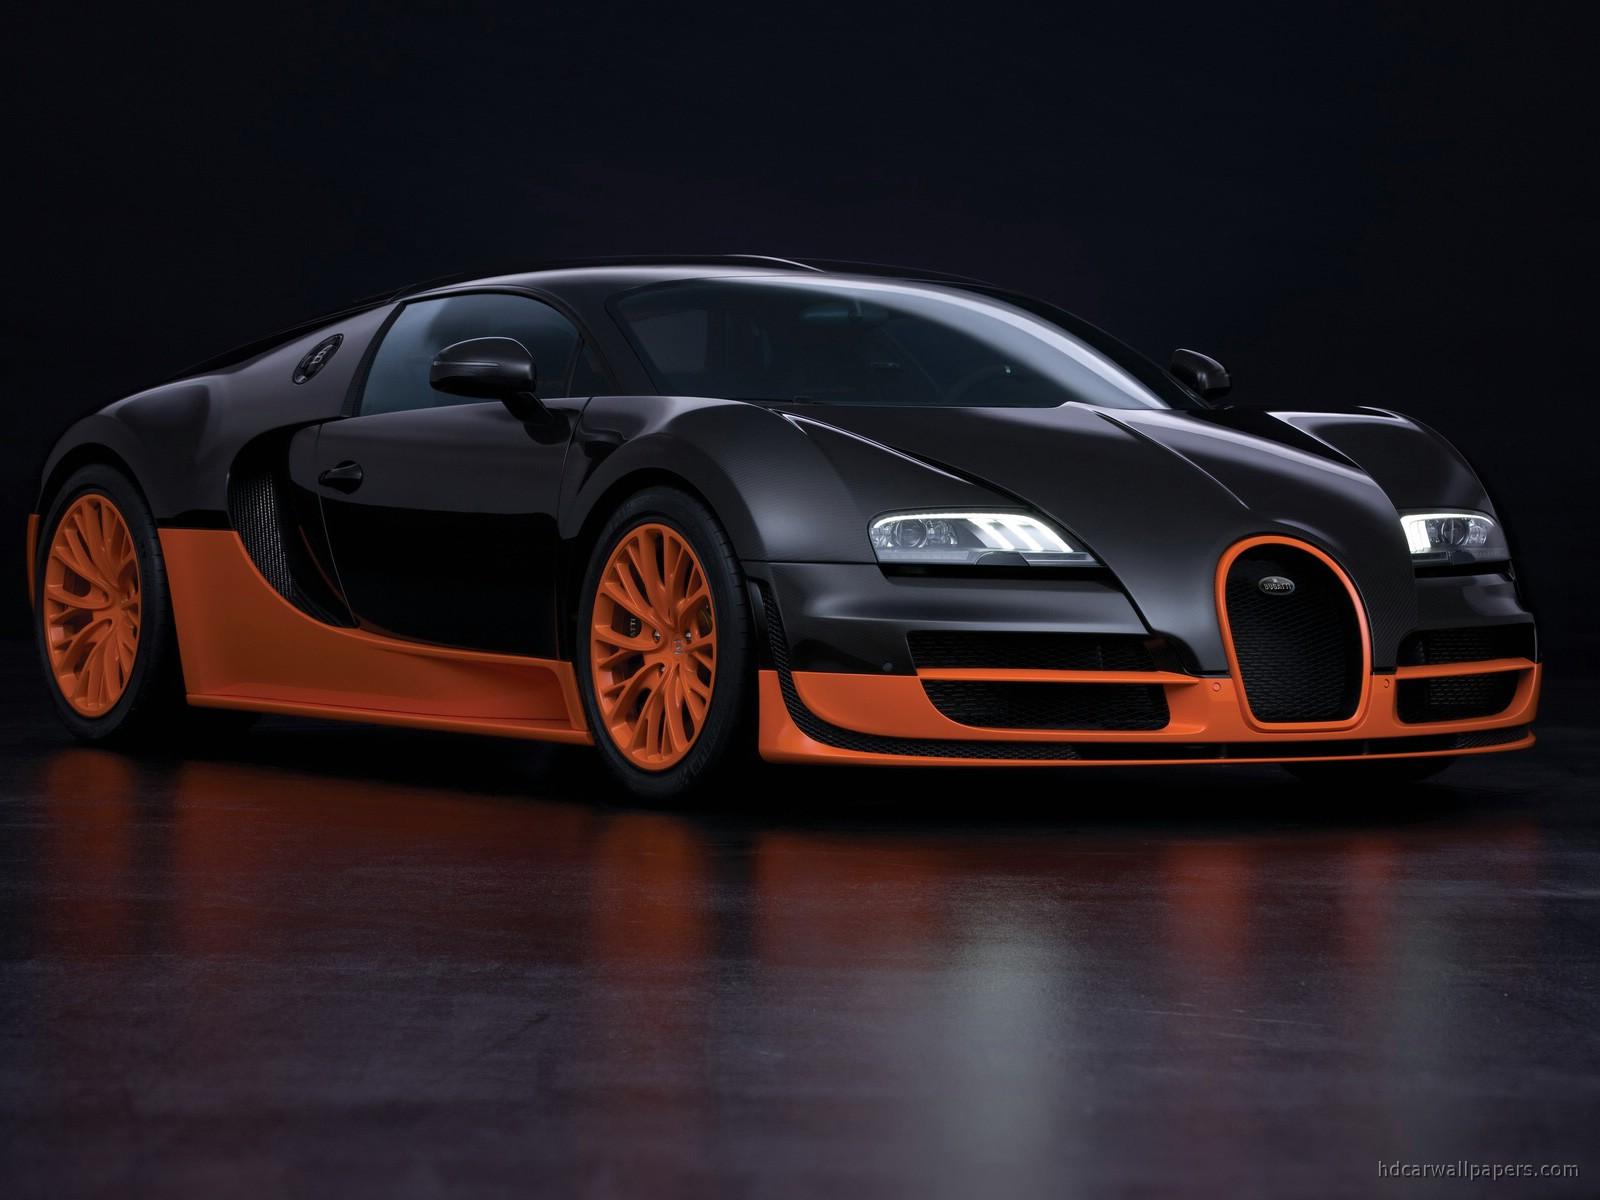 bugatti veyron 4k hd desktop wallpaper for 4k ultra hd tv wide. Bugatti Veyron 16 4 Super Sportrelated Car Wallpapers Wallpaper Cars Wallpaper Better